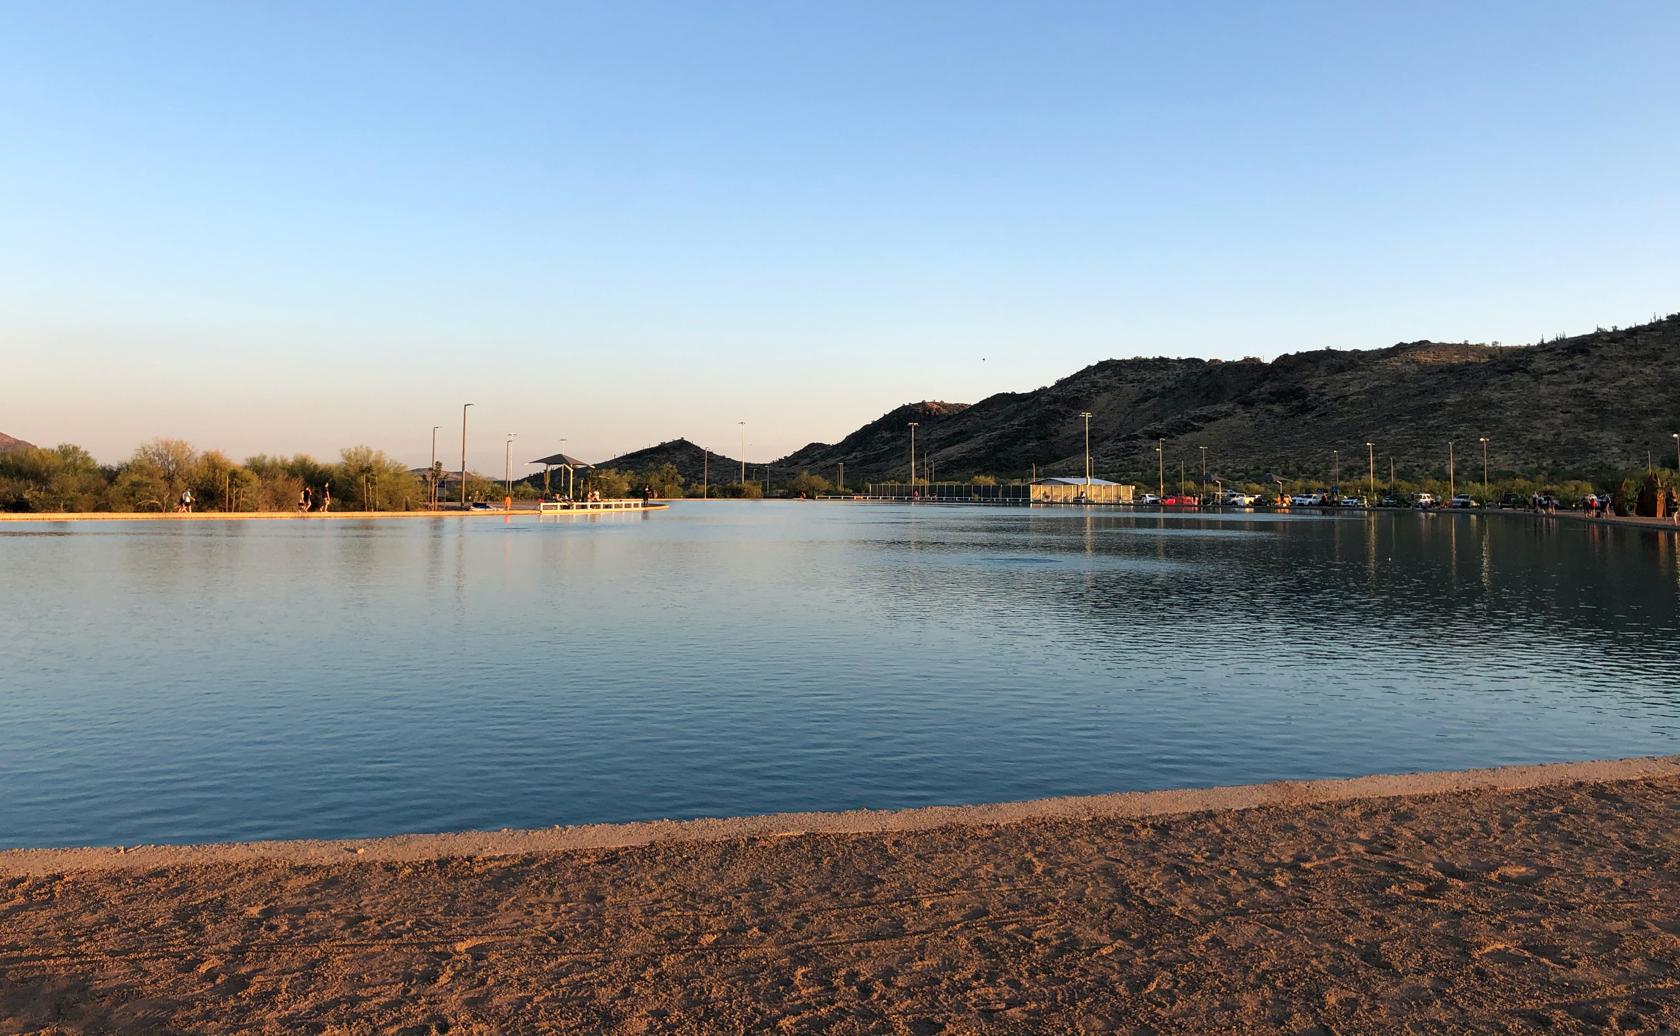 Paloma-Community-Lake-Fishing-Guide-Peoria-AZ-02